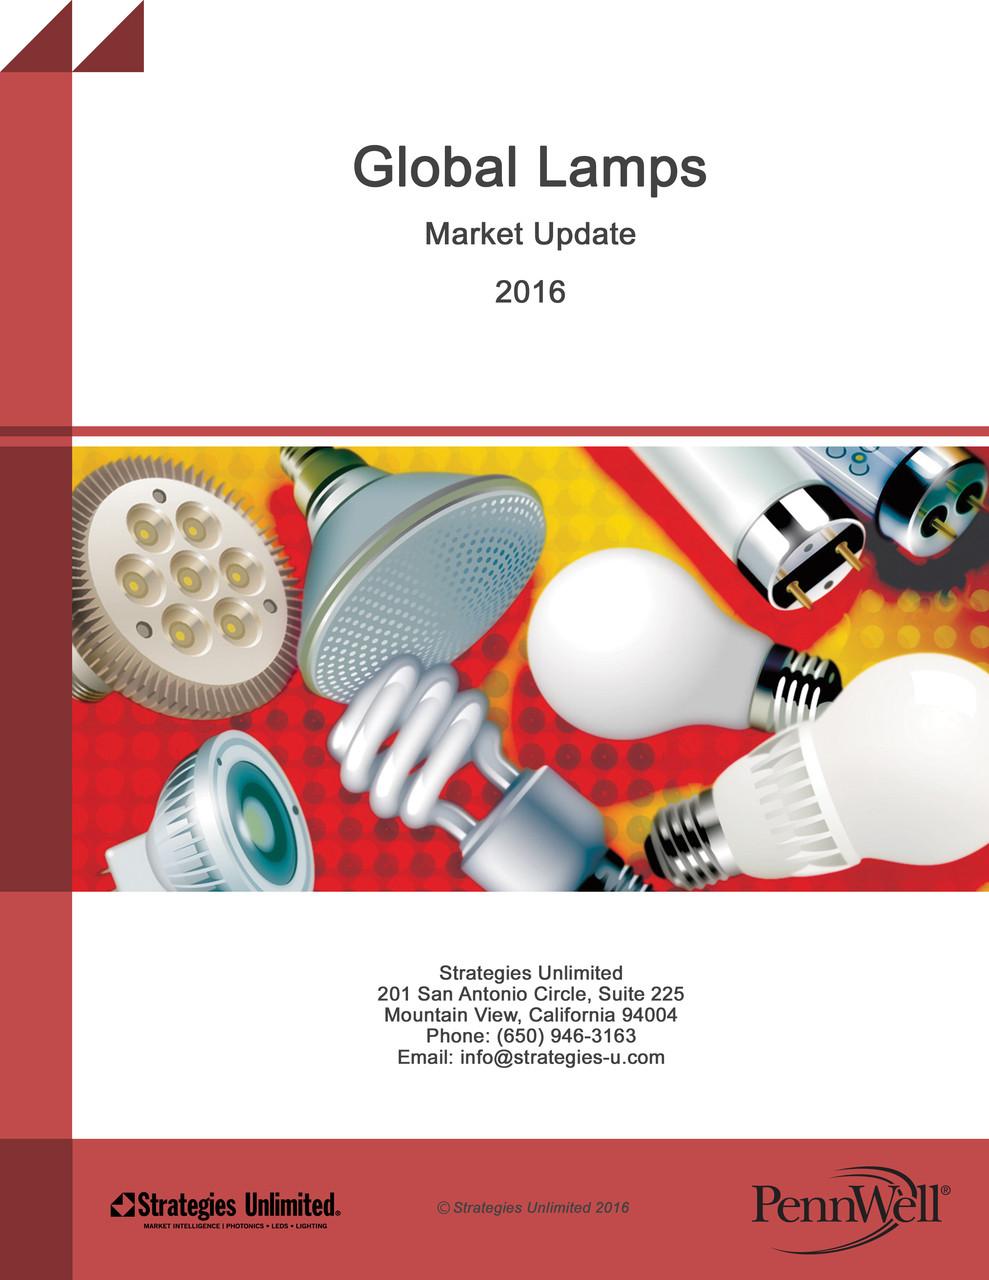 Global Lamp Market Update 2016 Strategies Unlimited